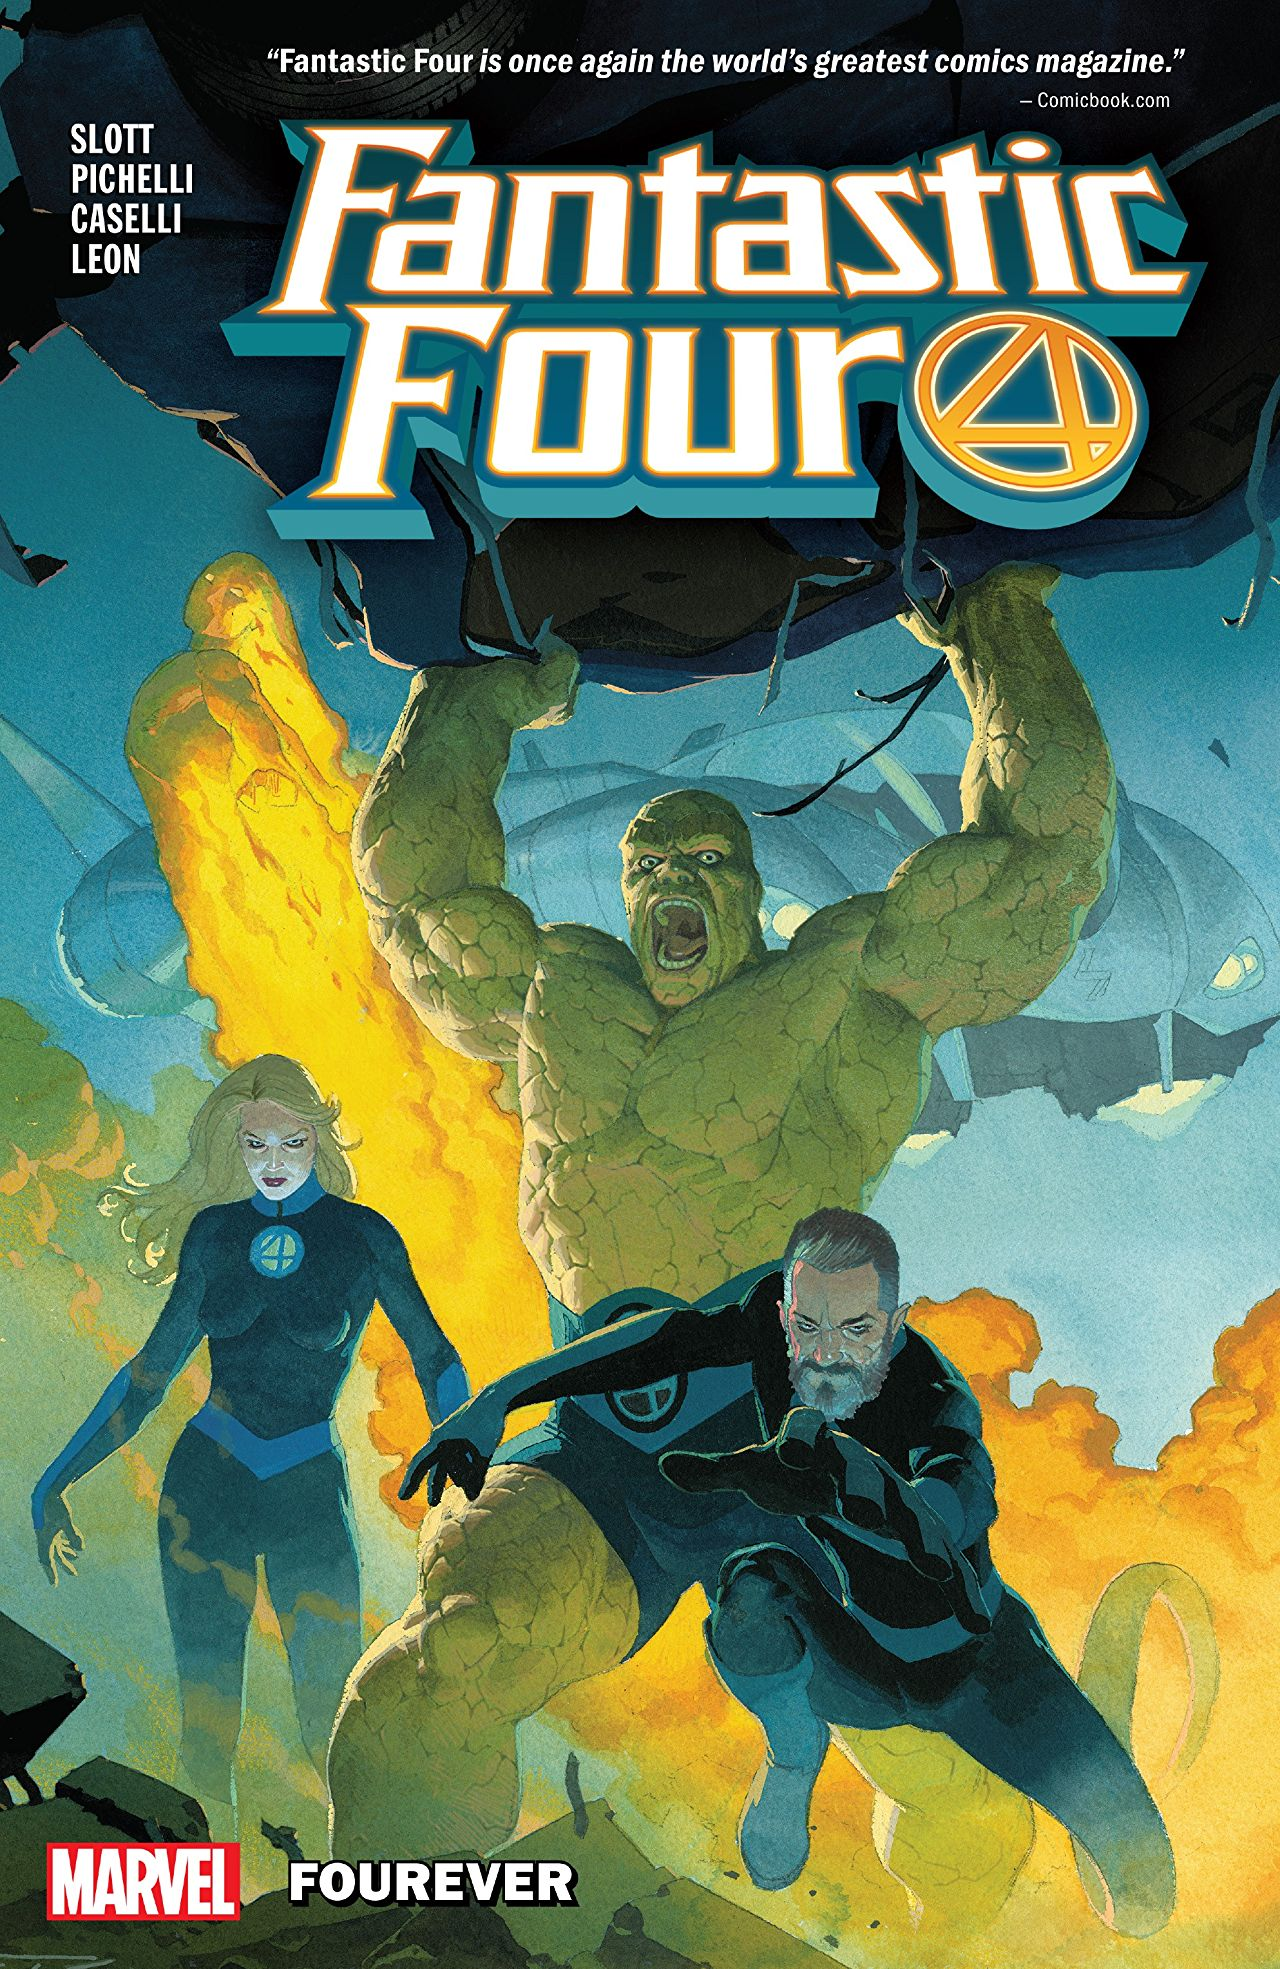 Fantastic Four by Dan Slott Vol. 1: Fourever Review